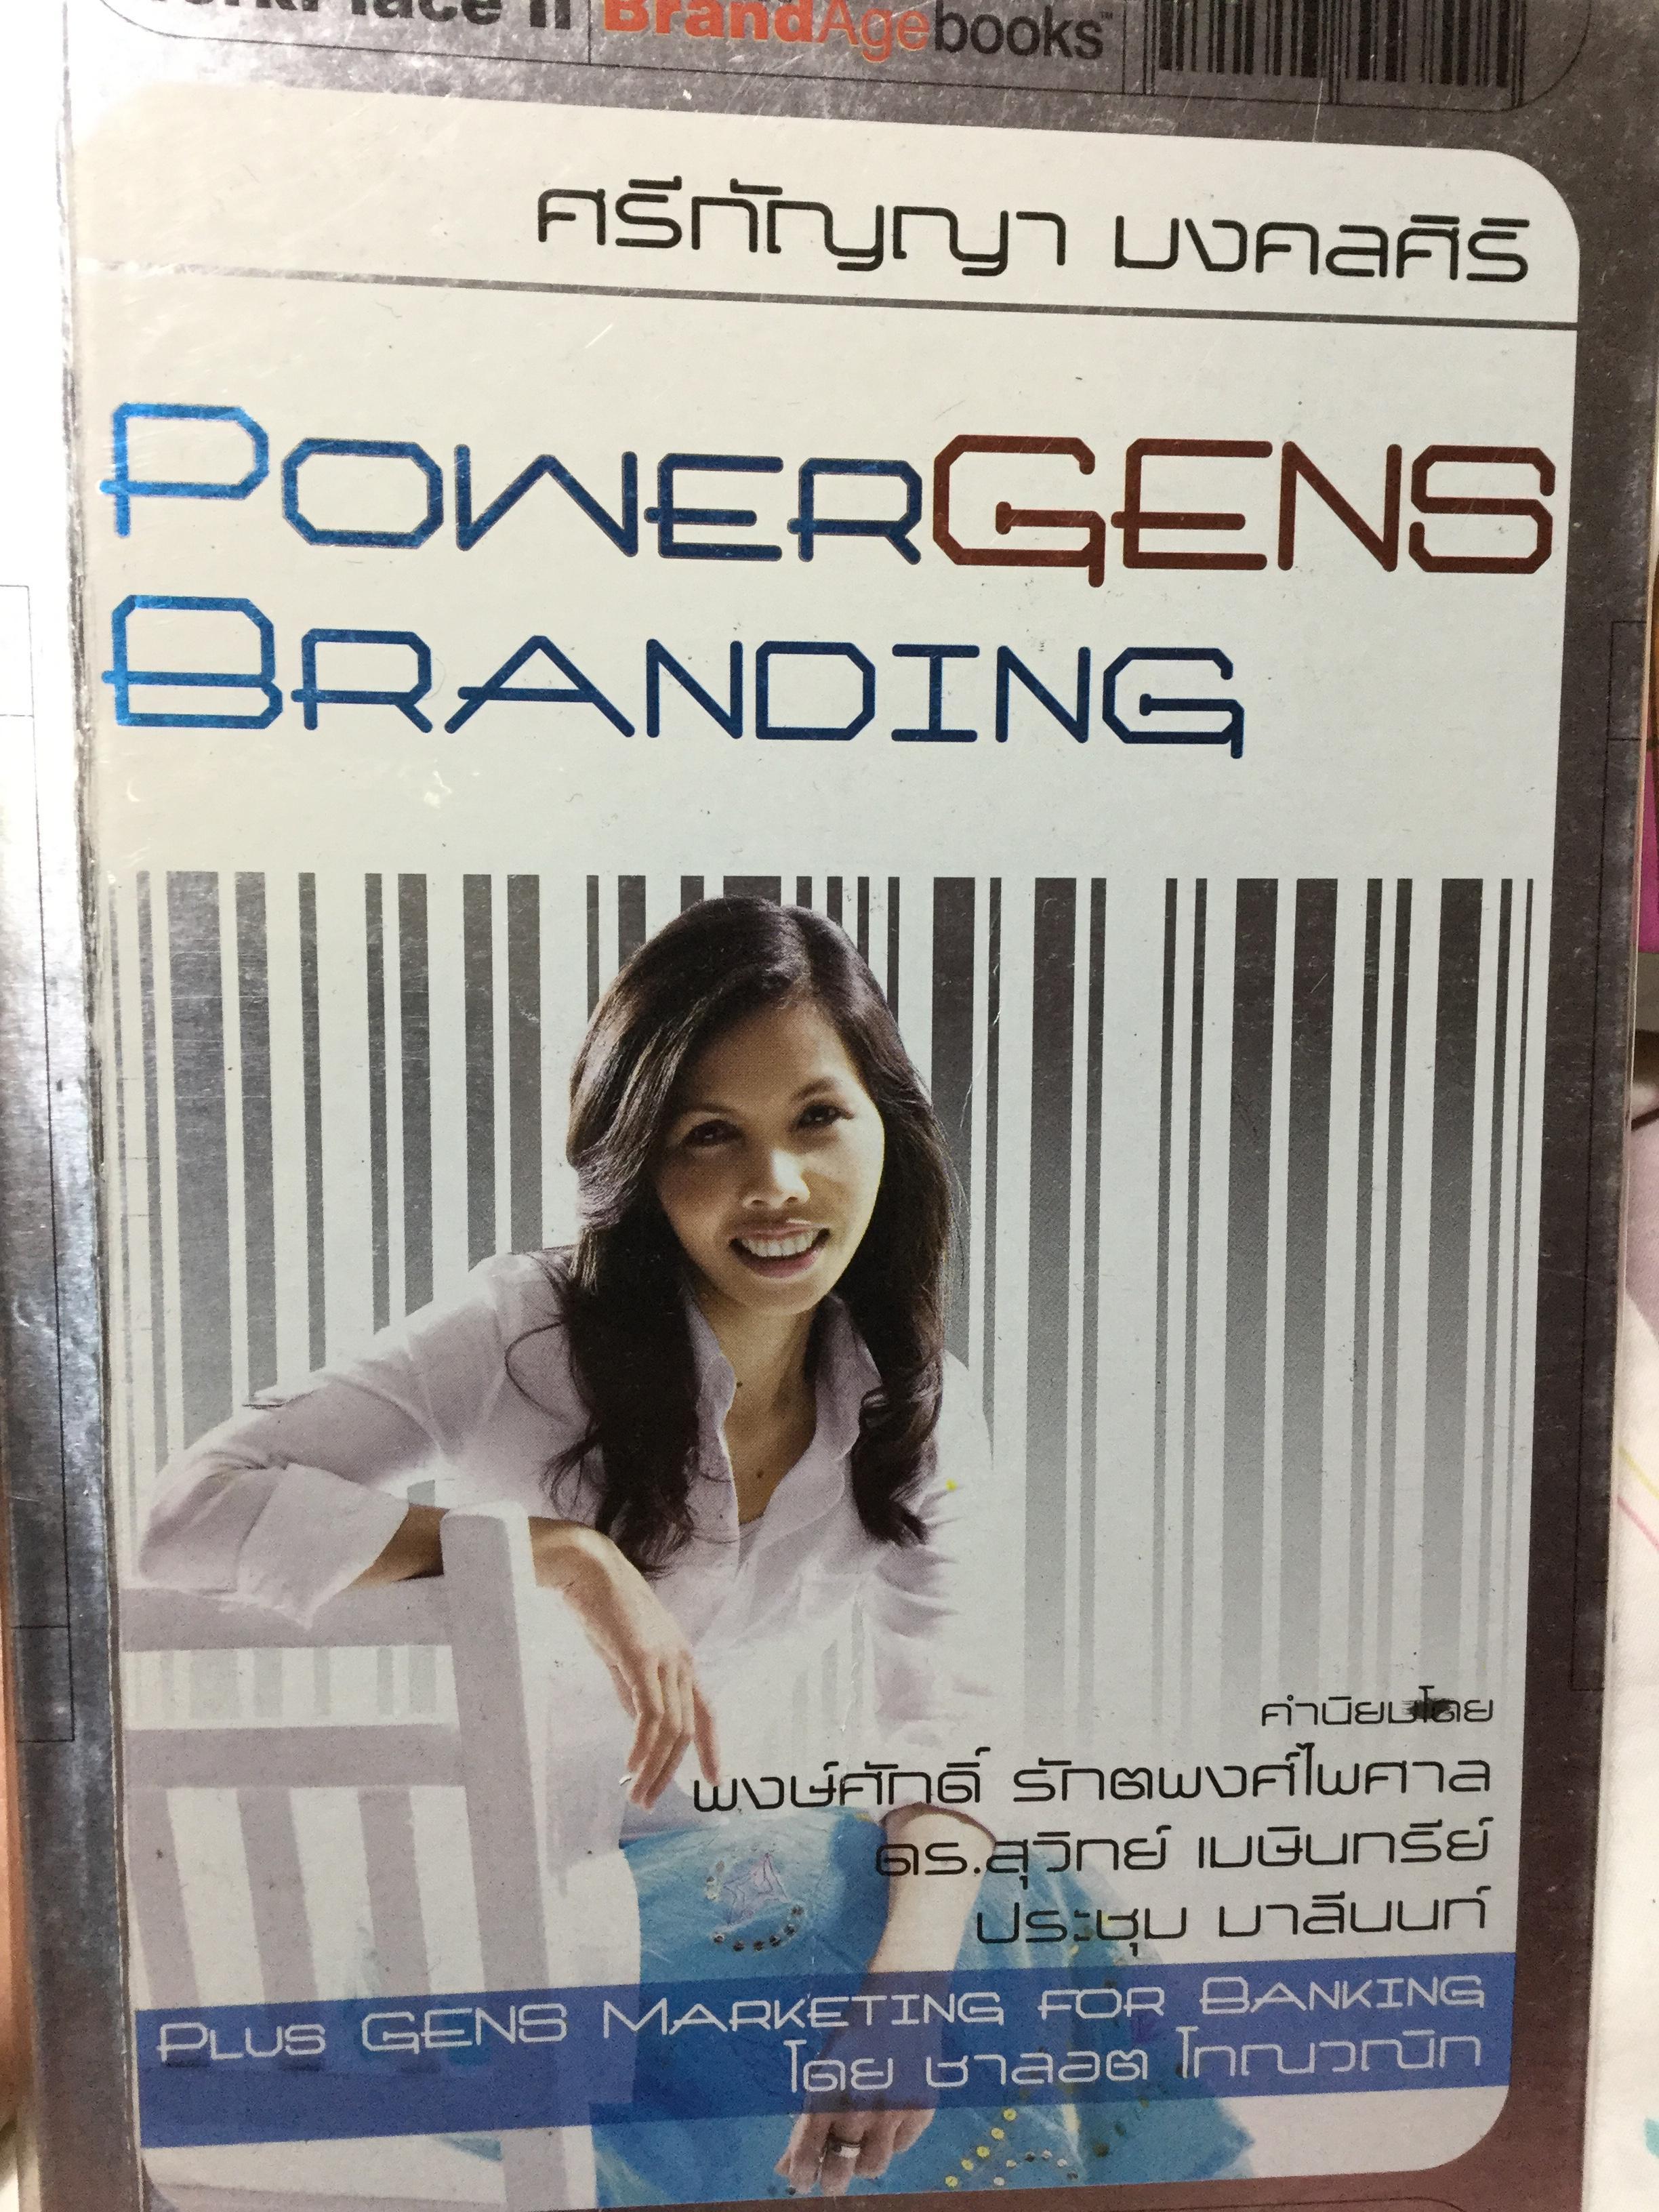 PowerGens Branding. ผู้เขียน ศรีกัญญา มงคลศิริ Plus gens Marketing for Banking